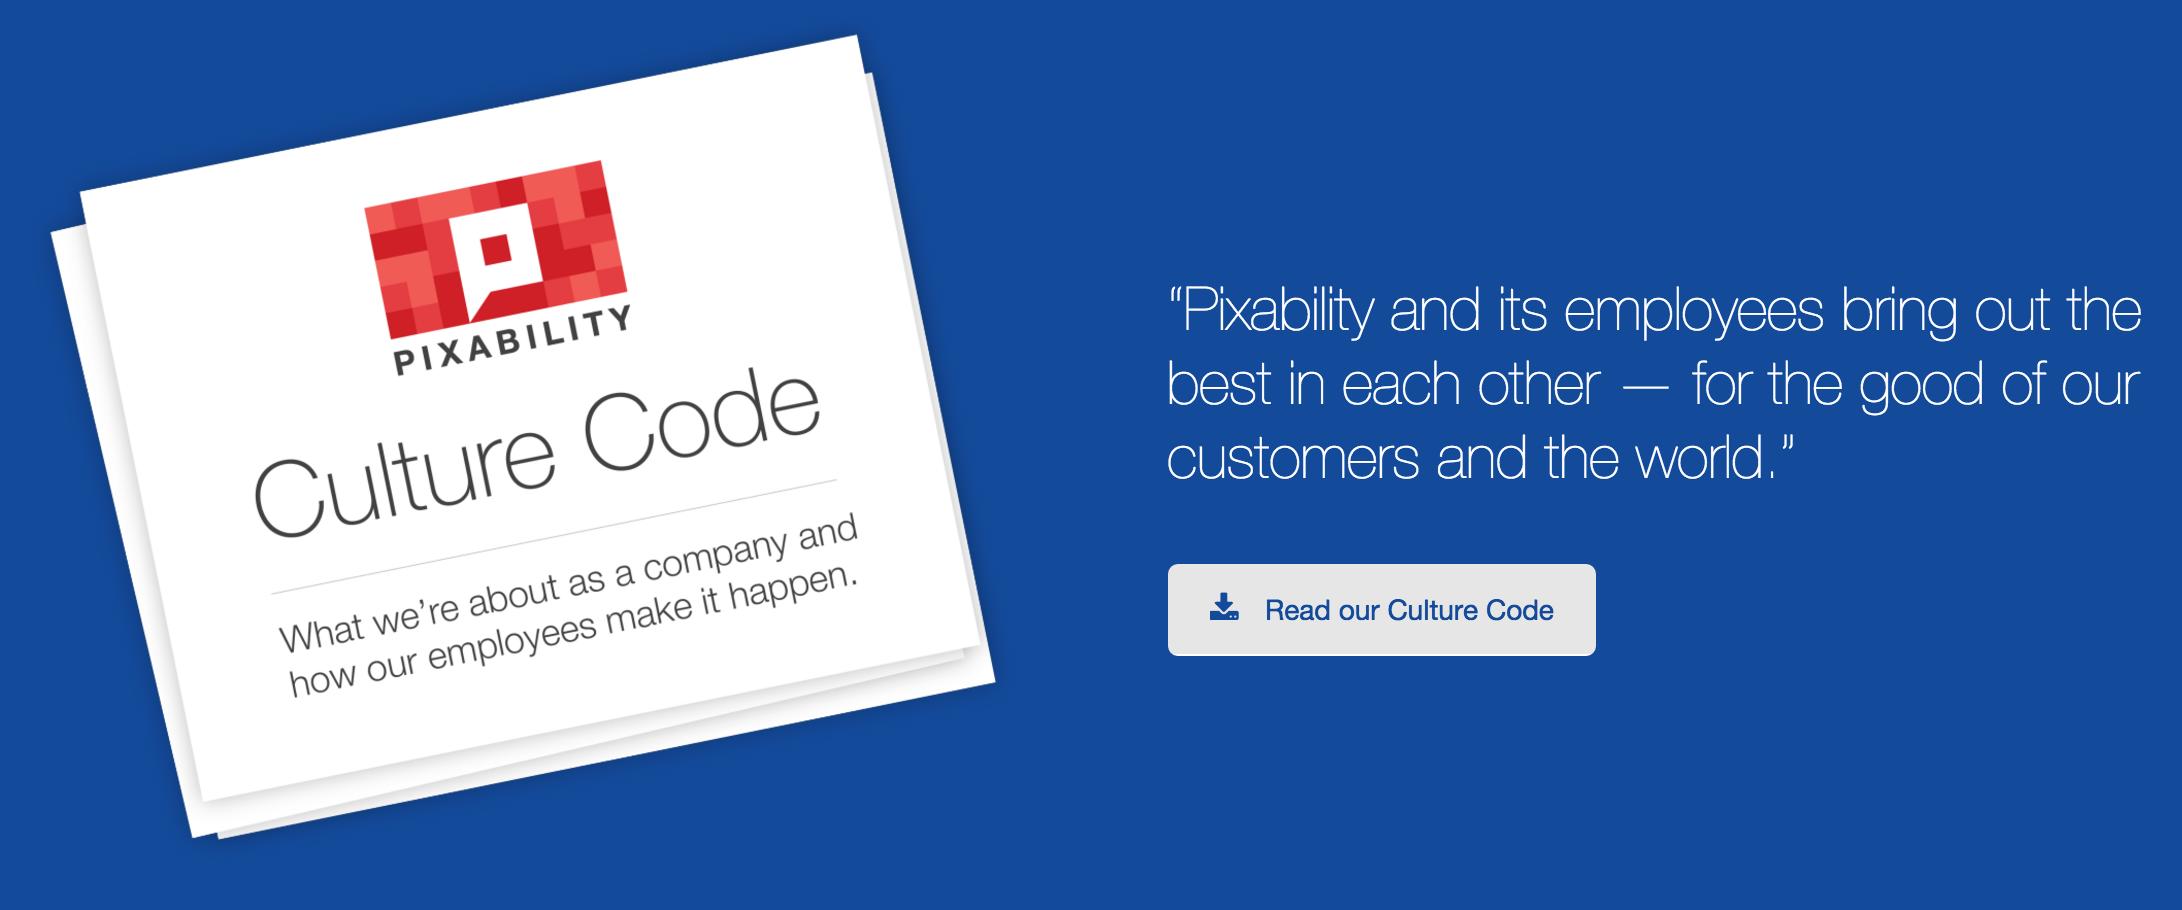 pixability culture code